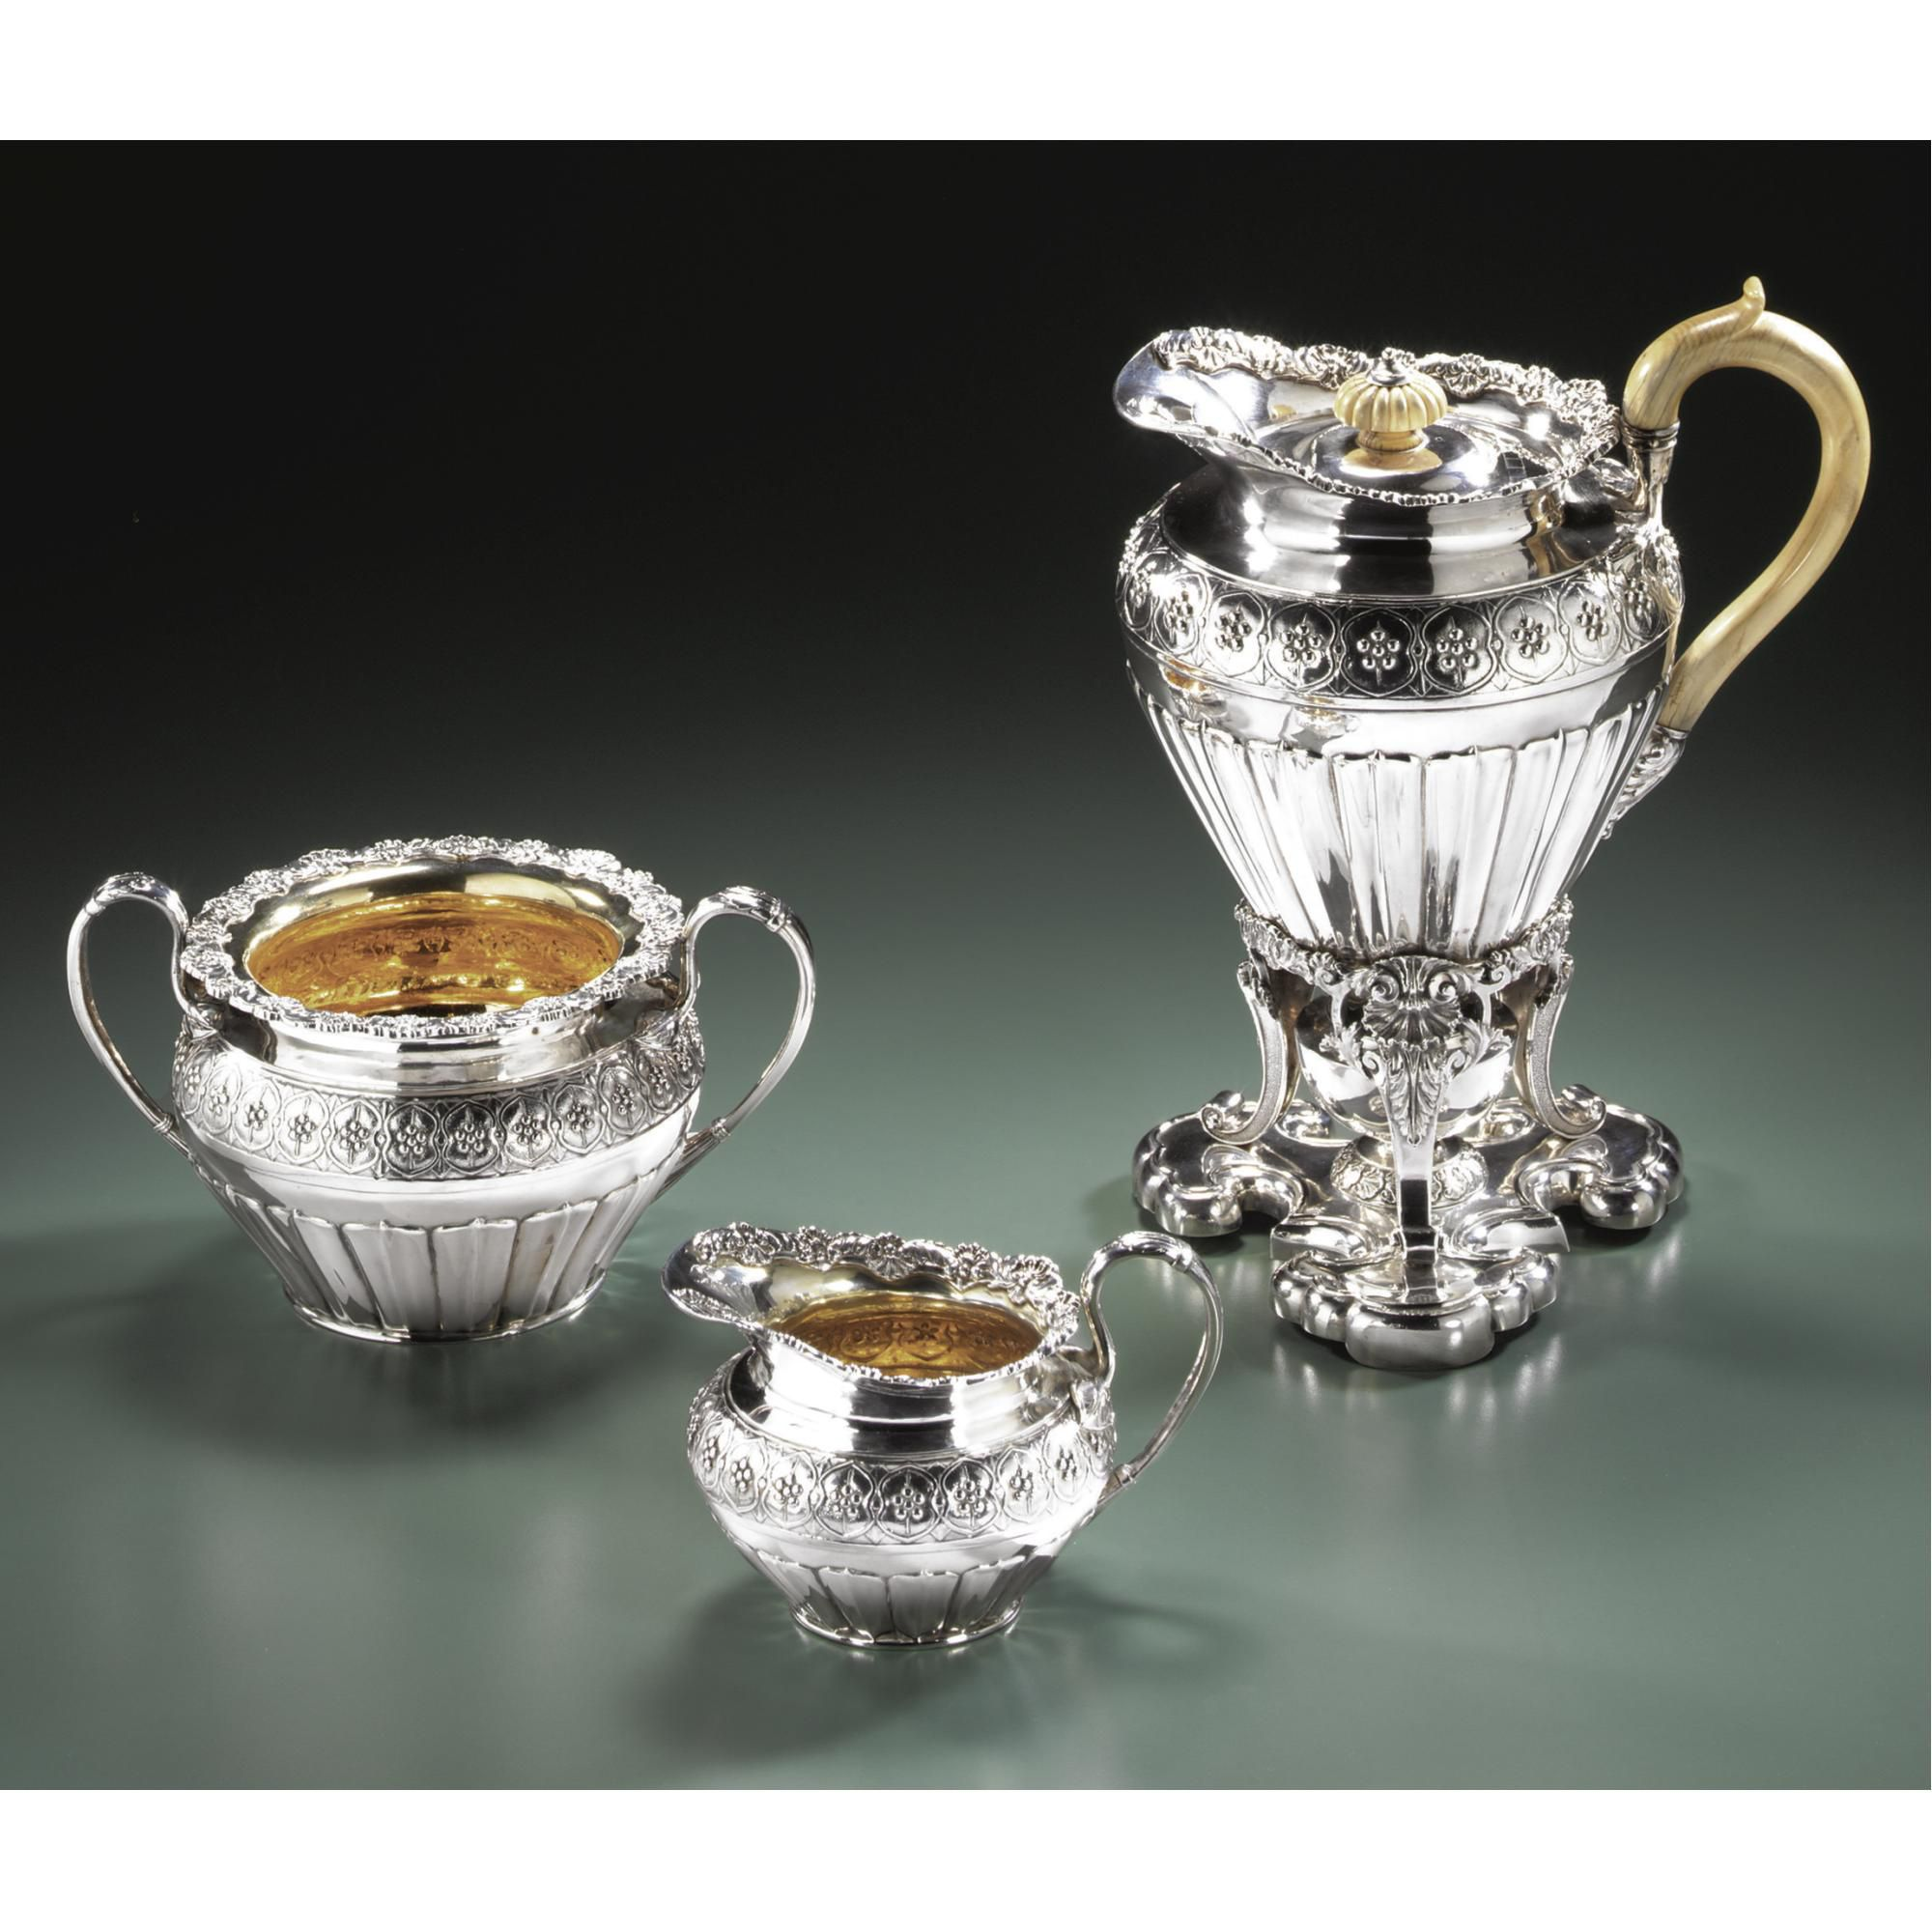 A Regency silver four-piece tea set, Philip Rundell, London, 1820/21 - Sotheby's